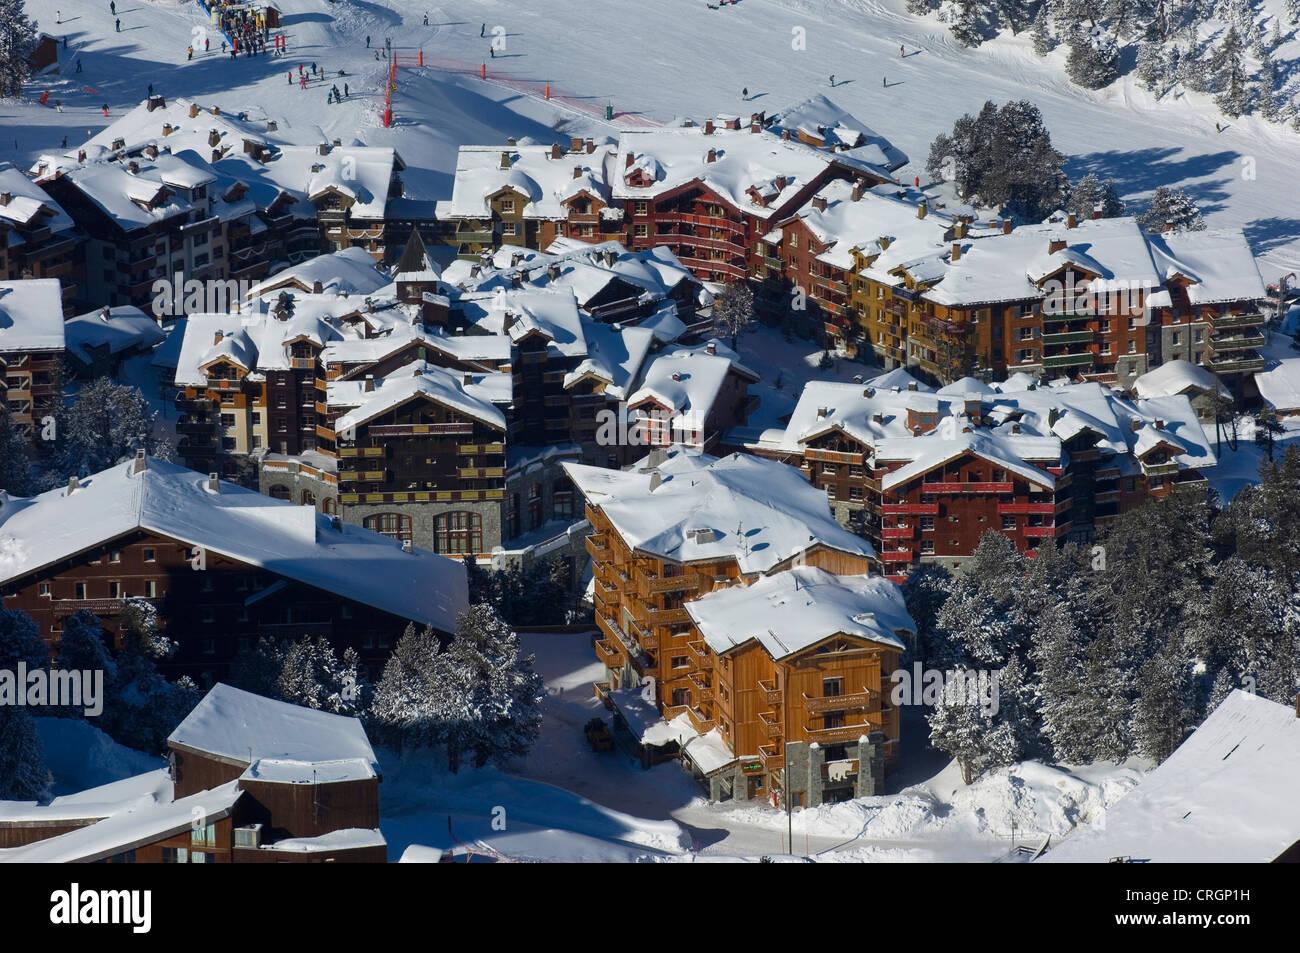 ski resort of Les Arcs 195O, France, Savoie, Alps - Stock Image